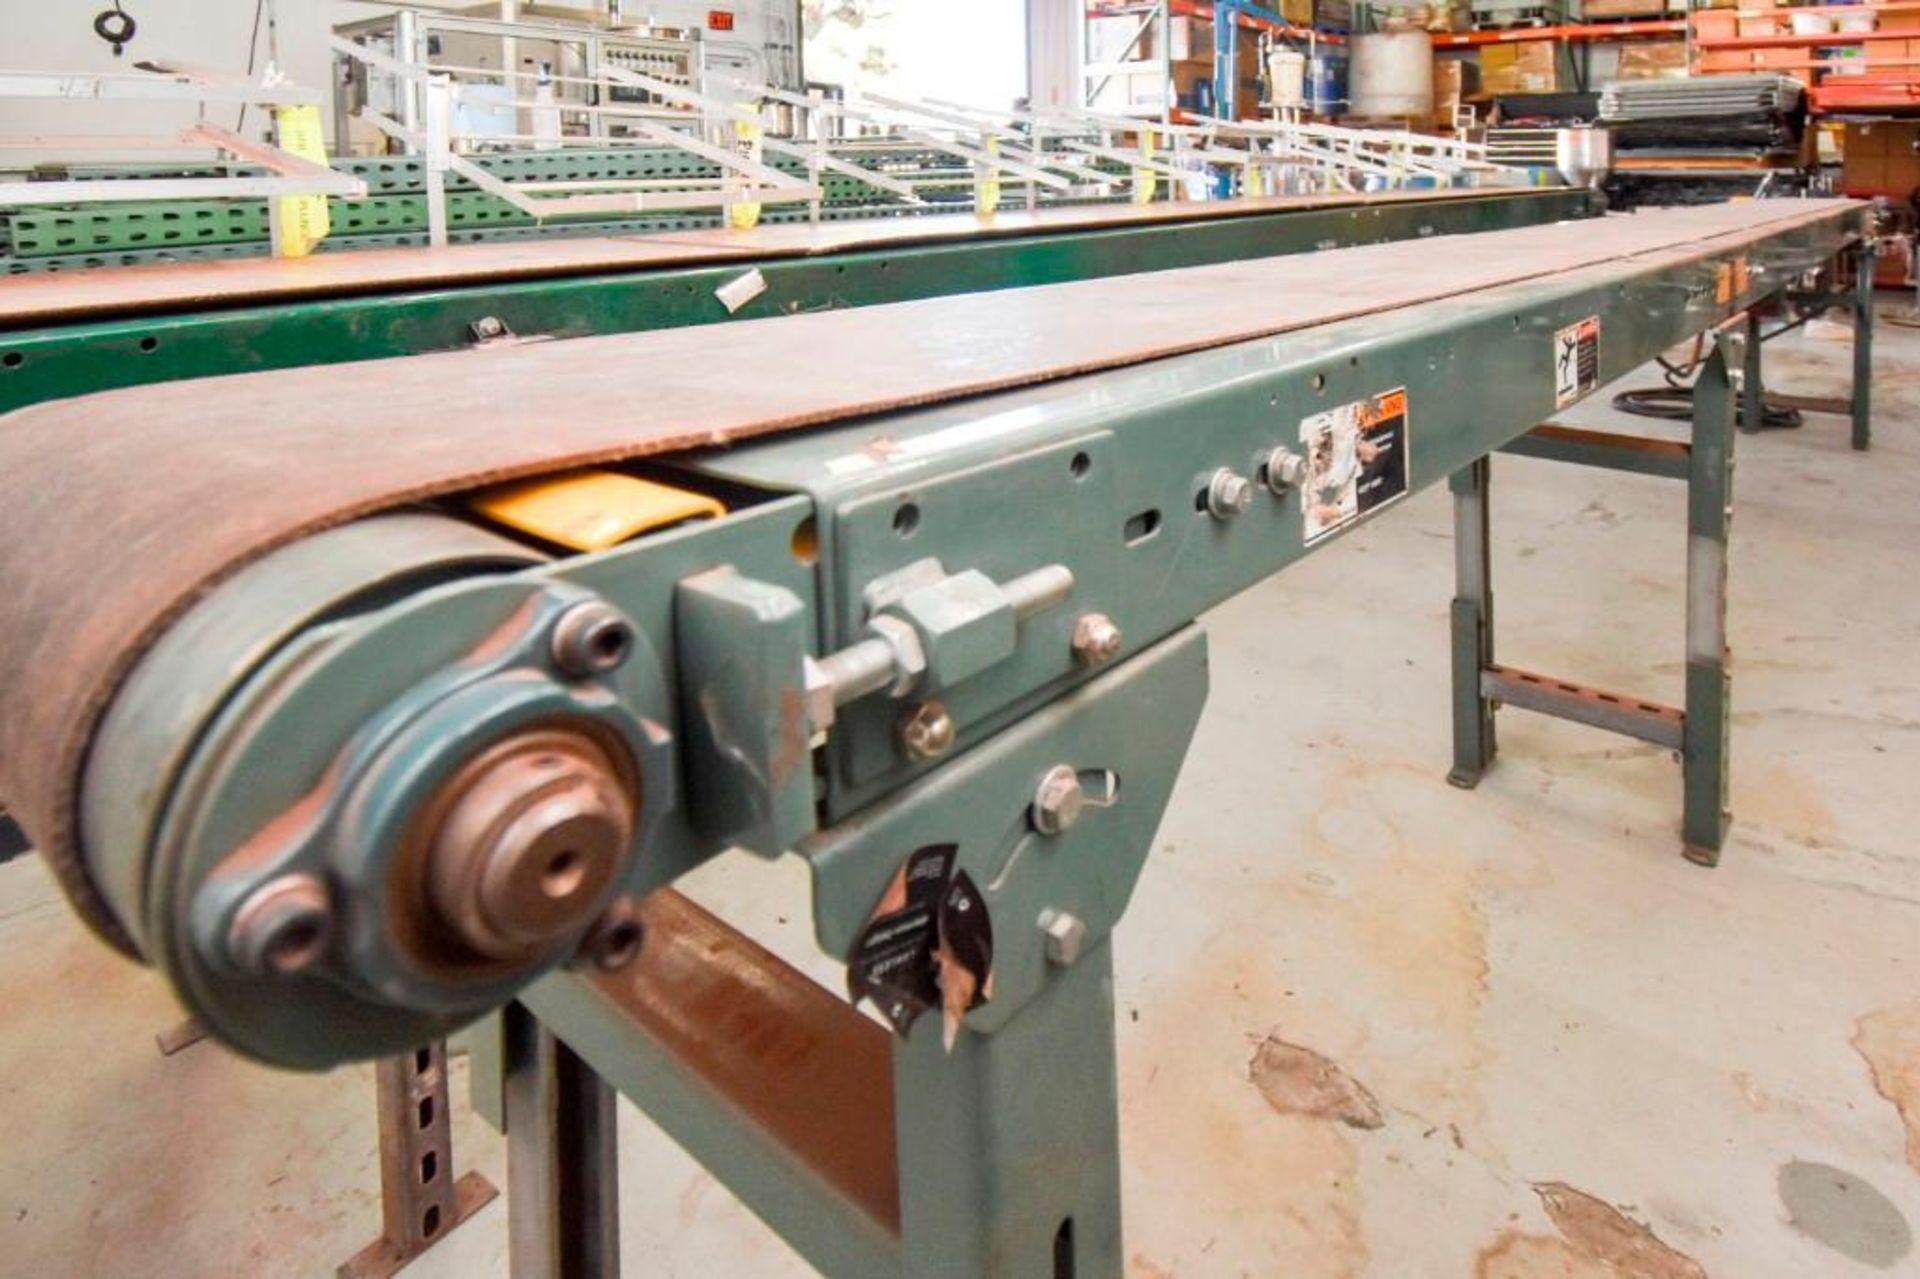 Hytrol Conveyor - Image 8 of 10